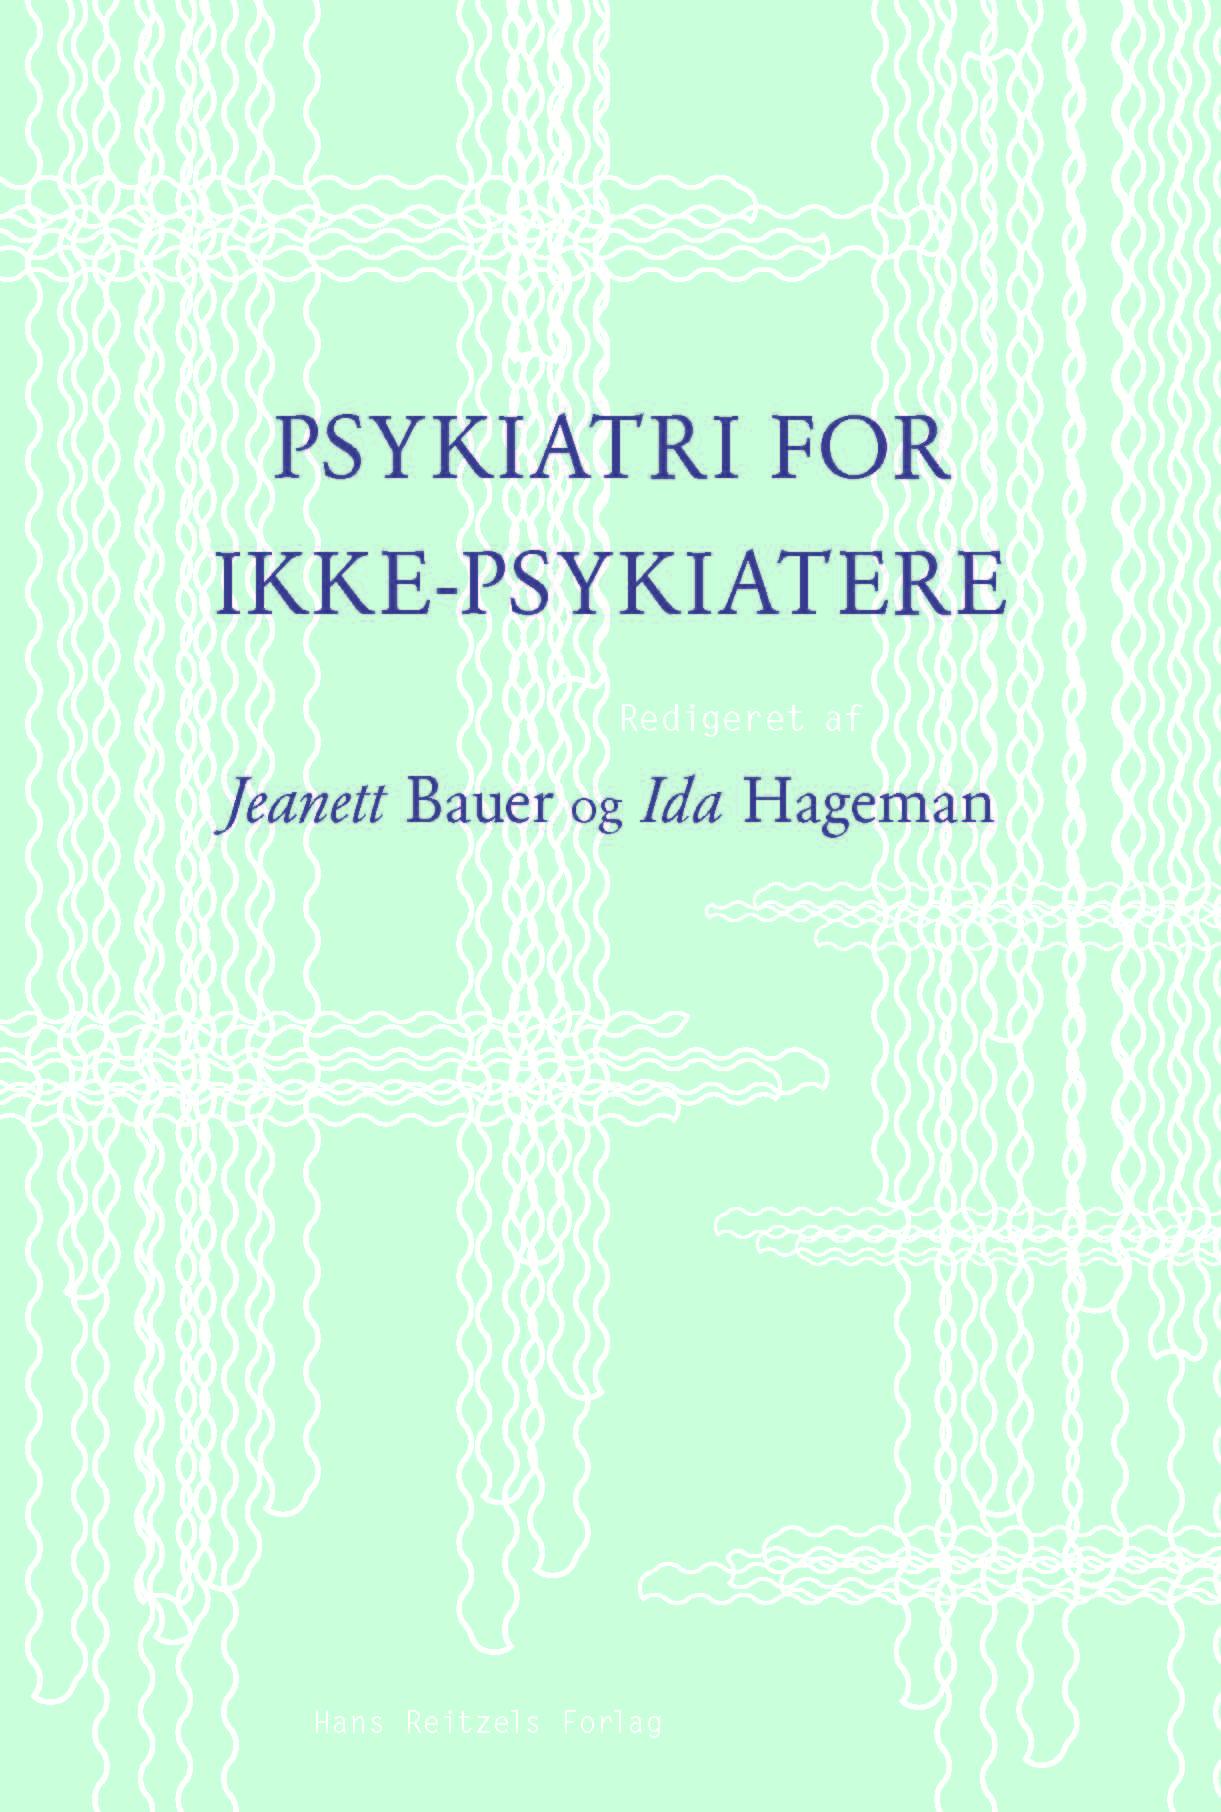 psykiatri for ikke psykiatere